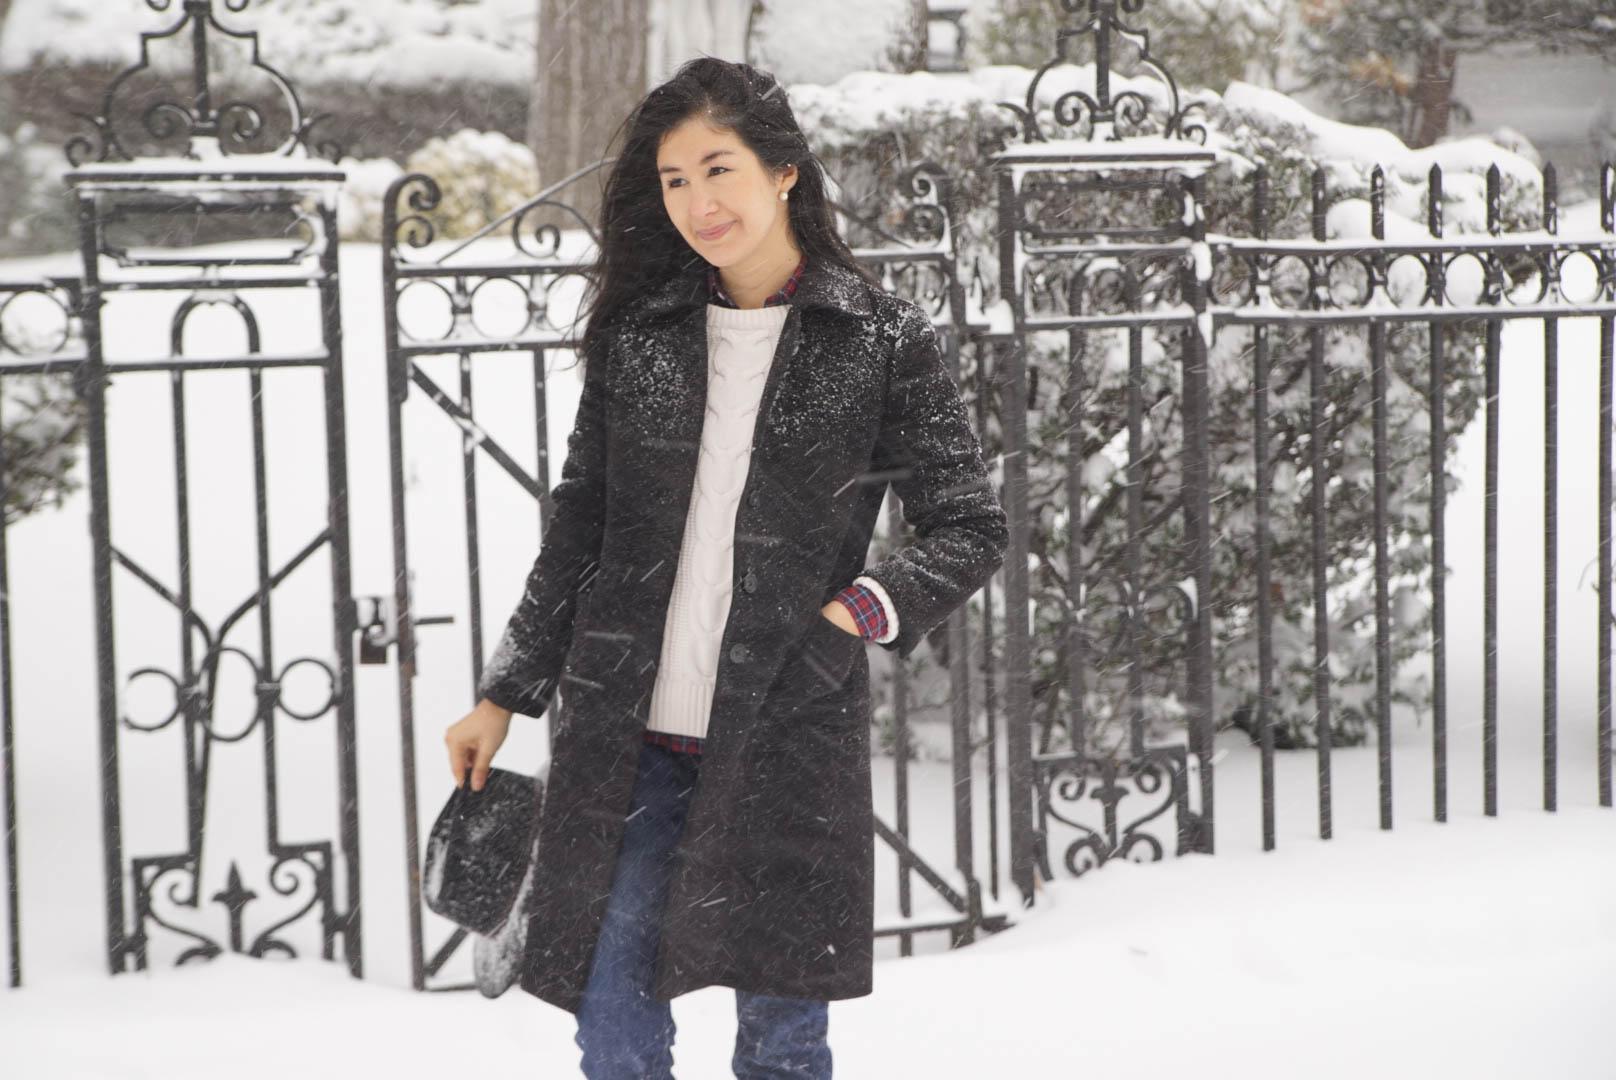 Wnter Storm Jonas Brooklyn New York Ralph Lauren Plaid Shirt LL bean Boots Levis 501 Jeans Brooks Brothers Jacket LL Bean Sweater 3.jpeg